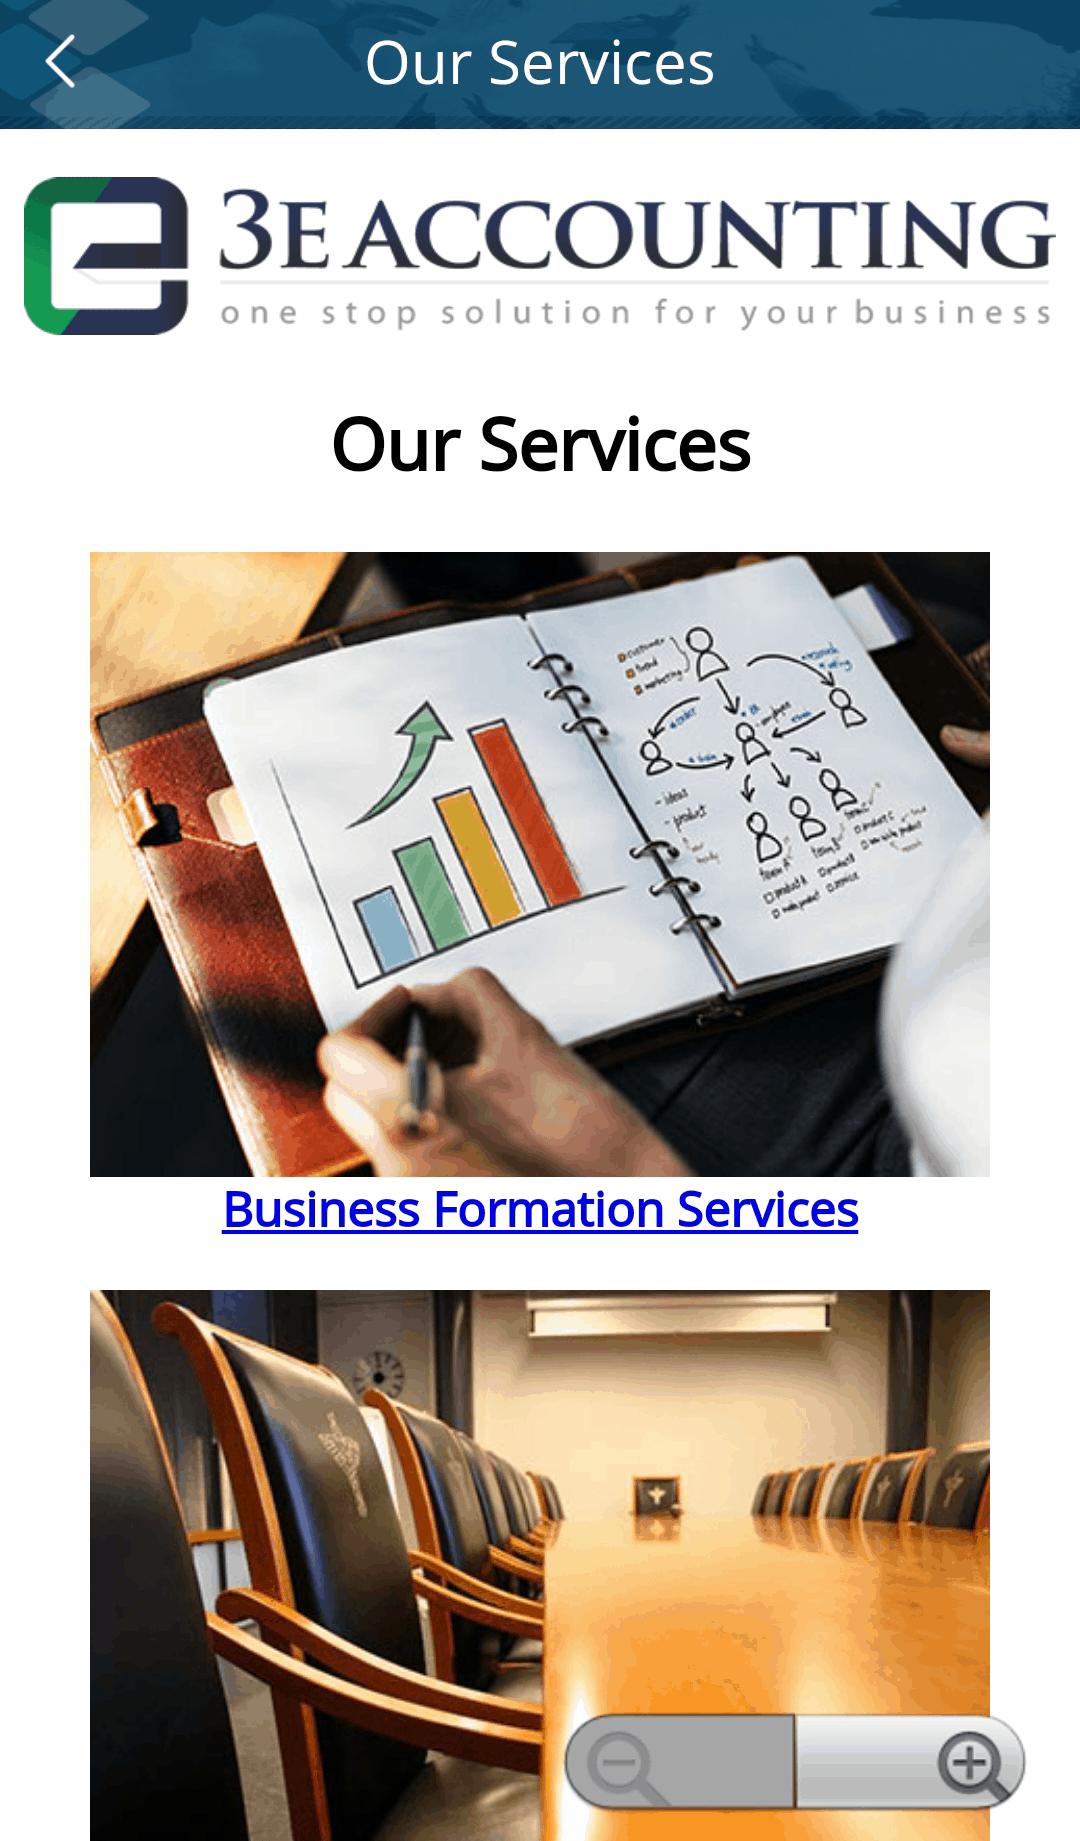 3E会计国际服务列表